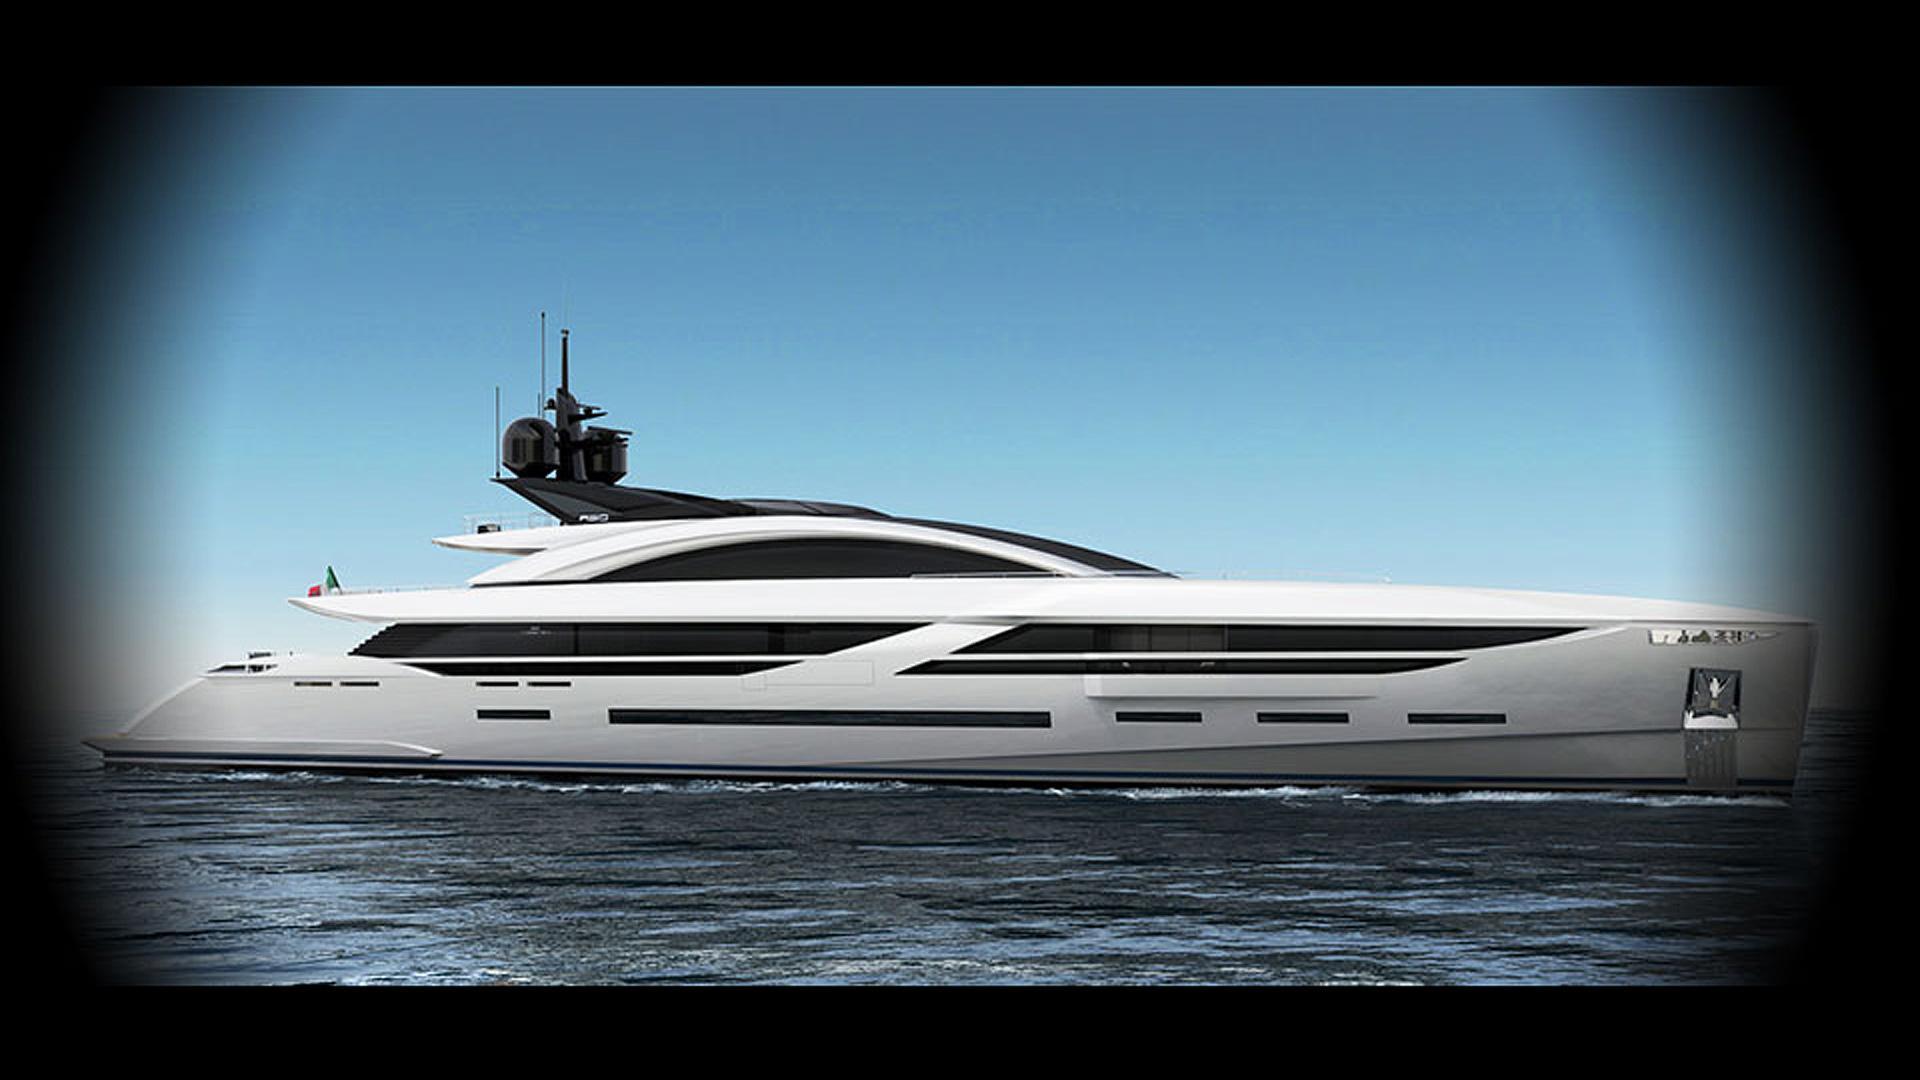 rossinavi-fr036-motoryacht-rossinavi-2018-49m-profile-rendering